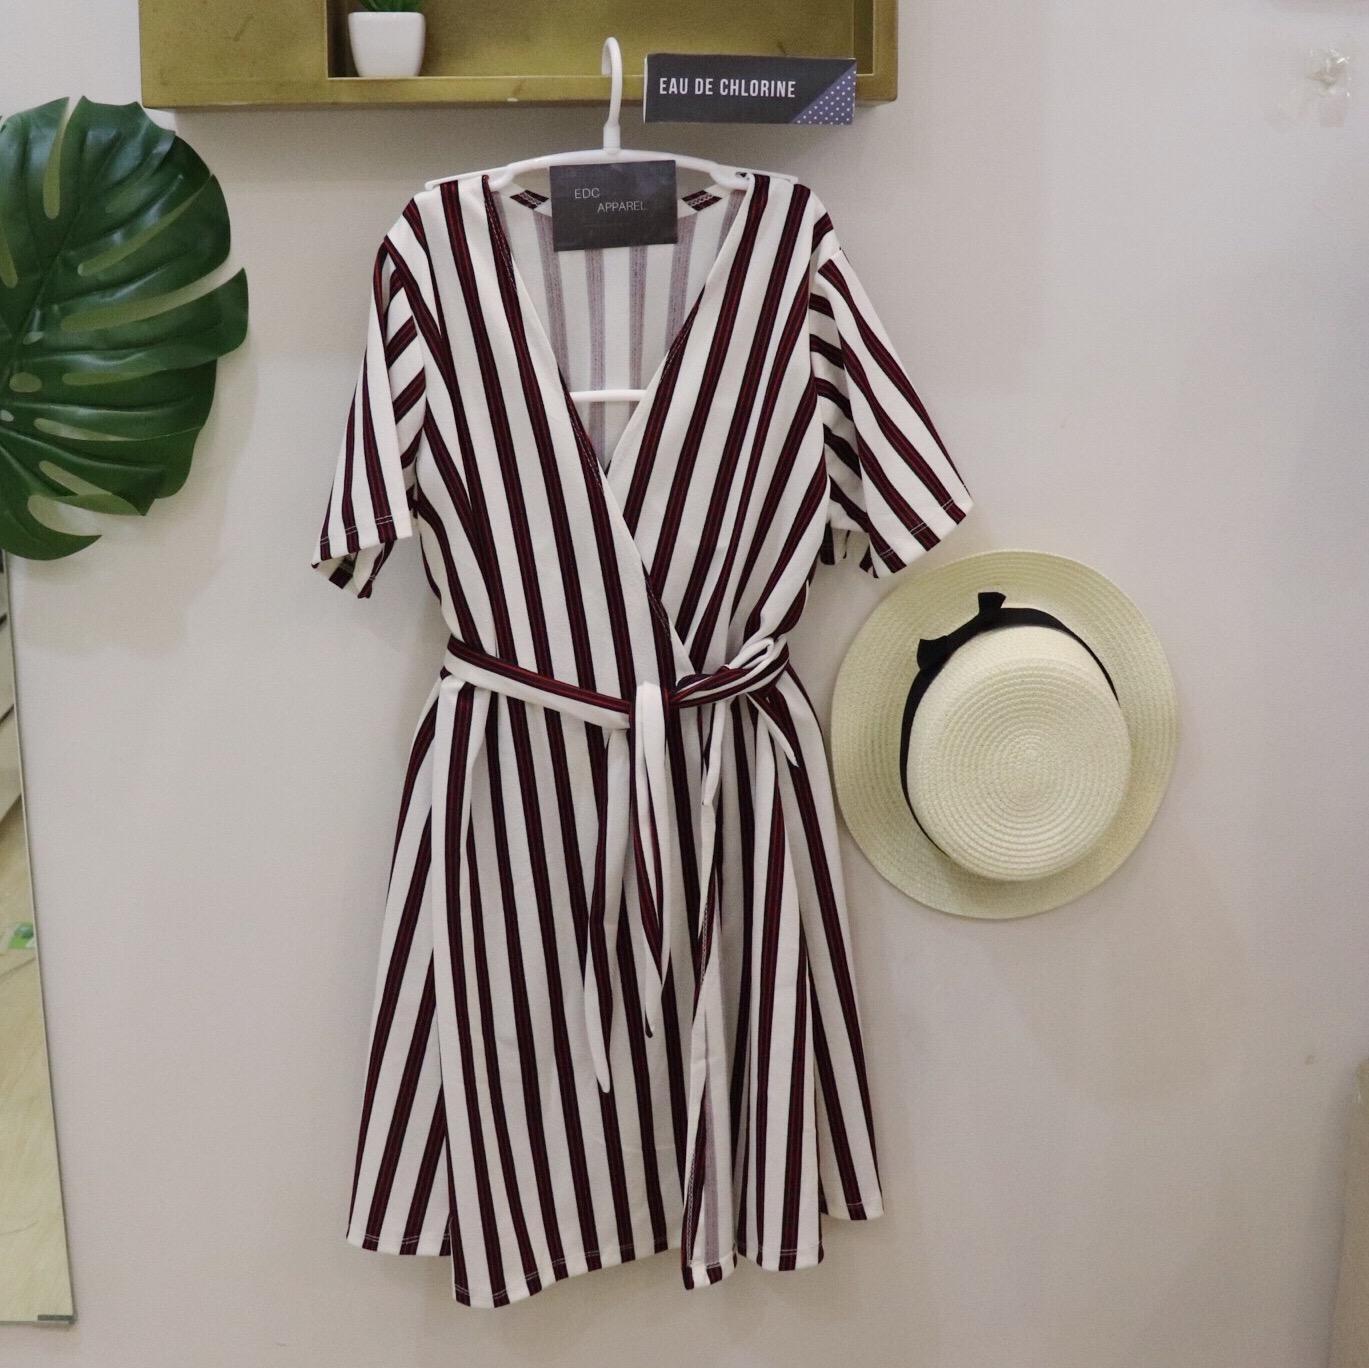 51eefa1e2efc Niki Stripes Dress Wrap Around Dress Wrap Dress Mustard Dress Blue Dress  Simple Dress Plain Dress